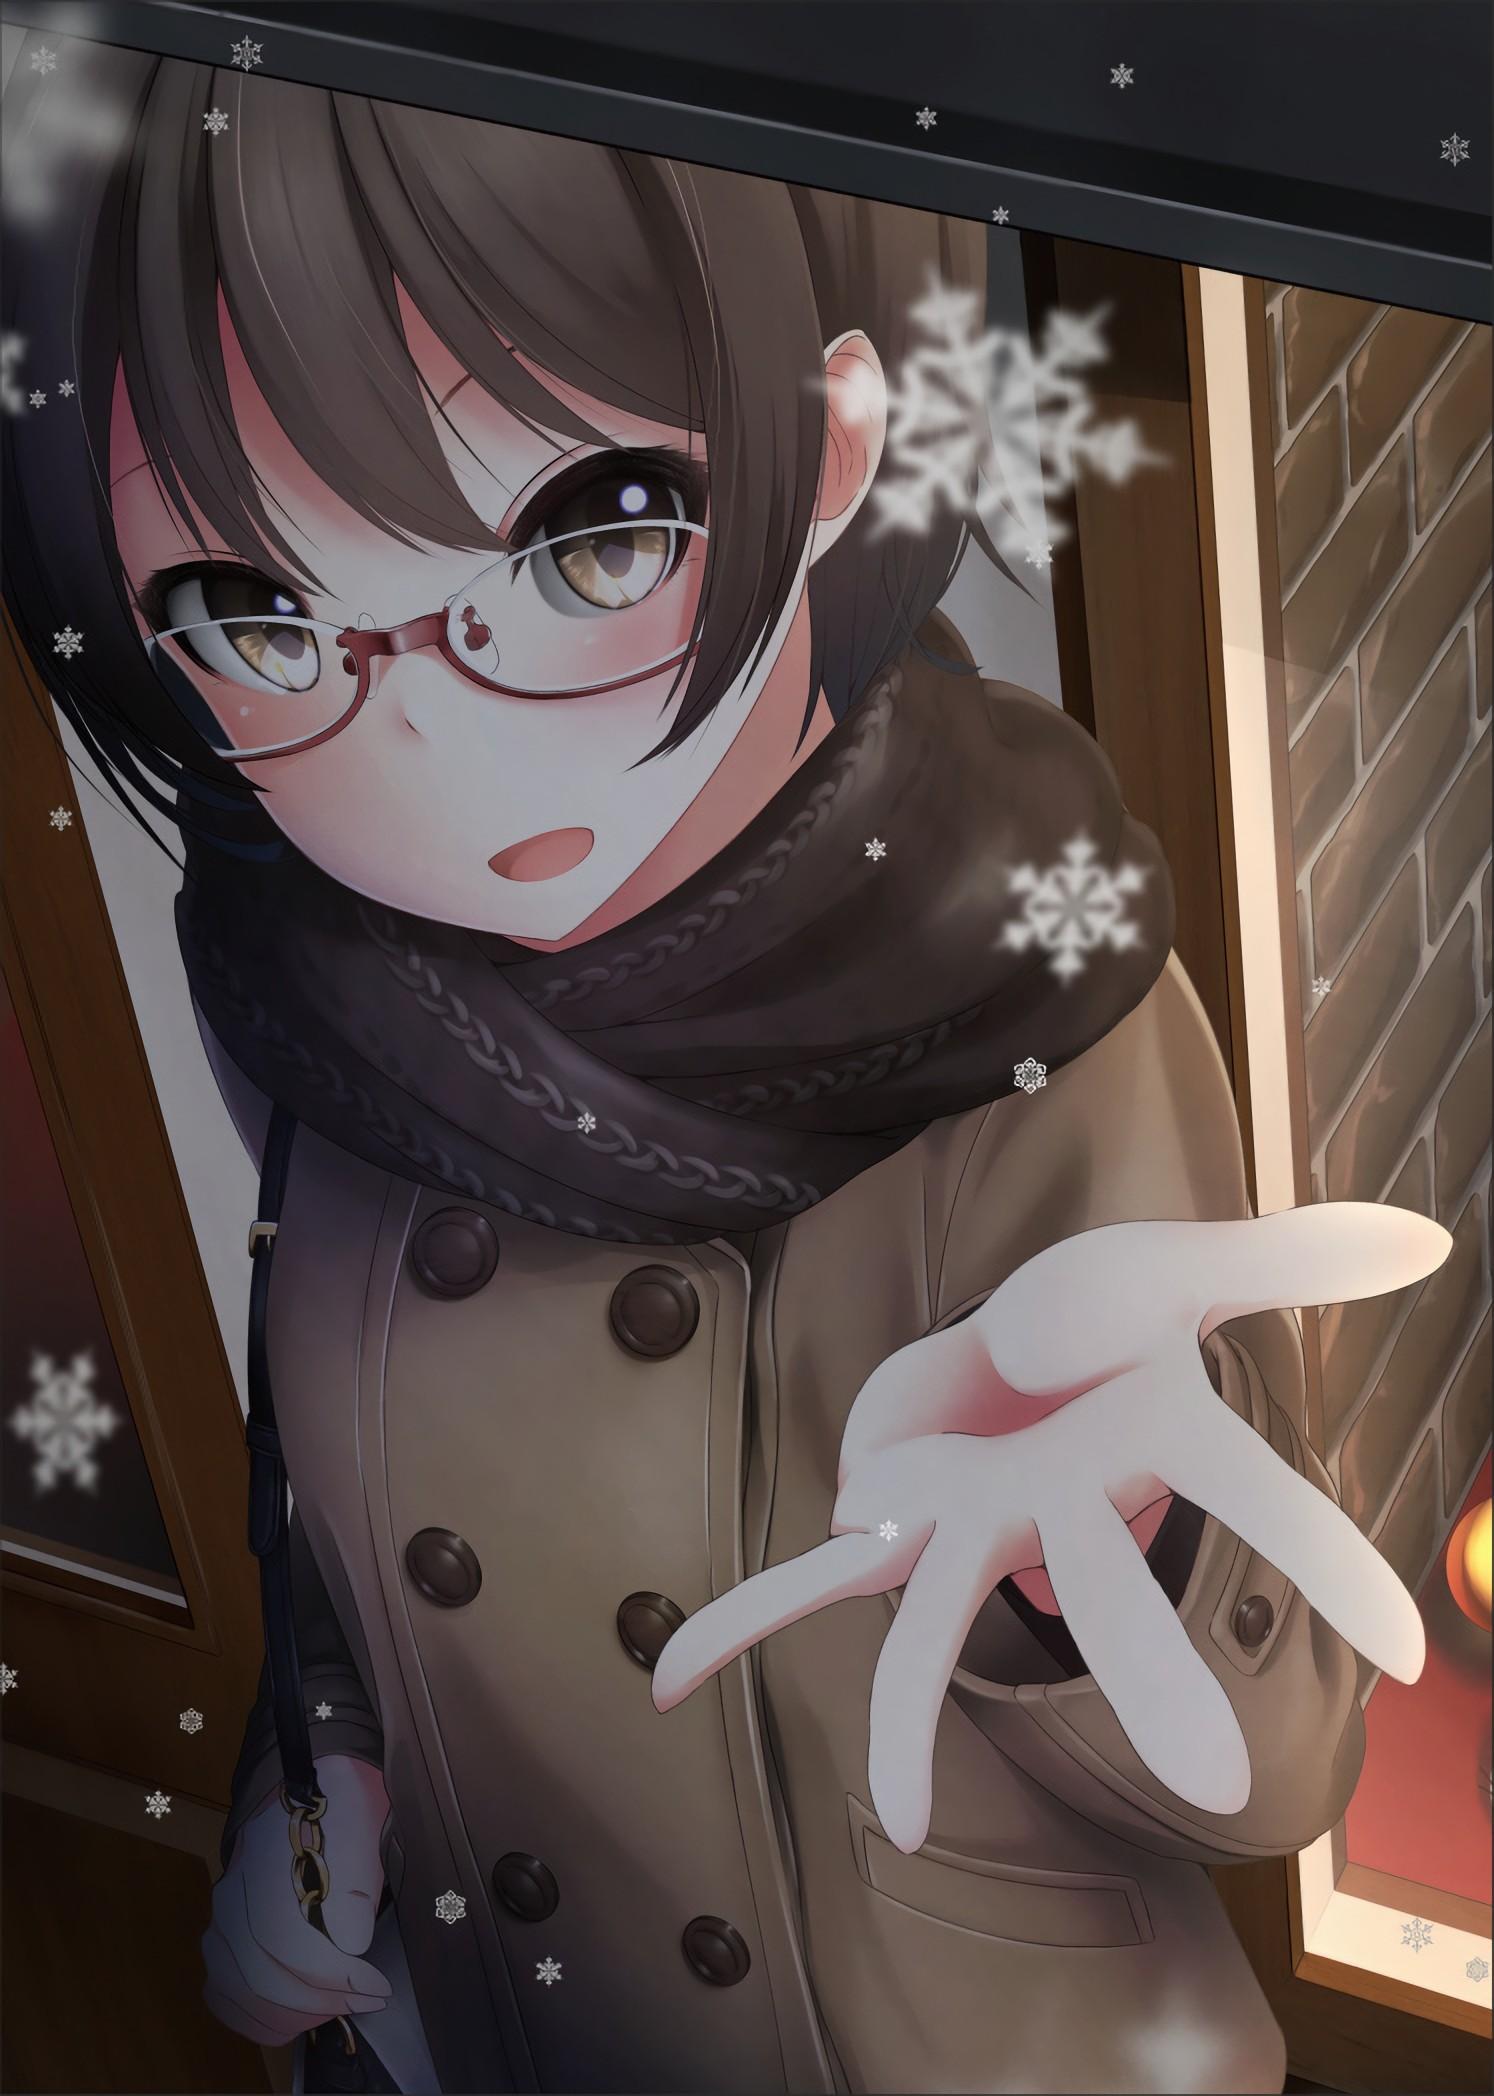 Anime girl black hair red eyes